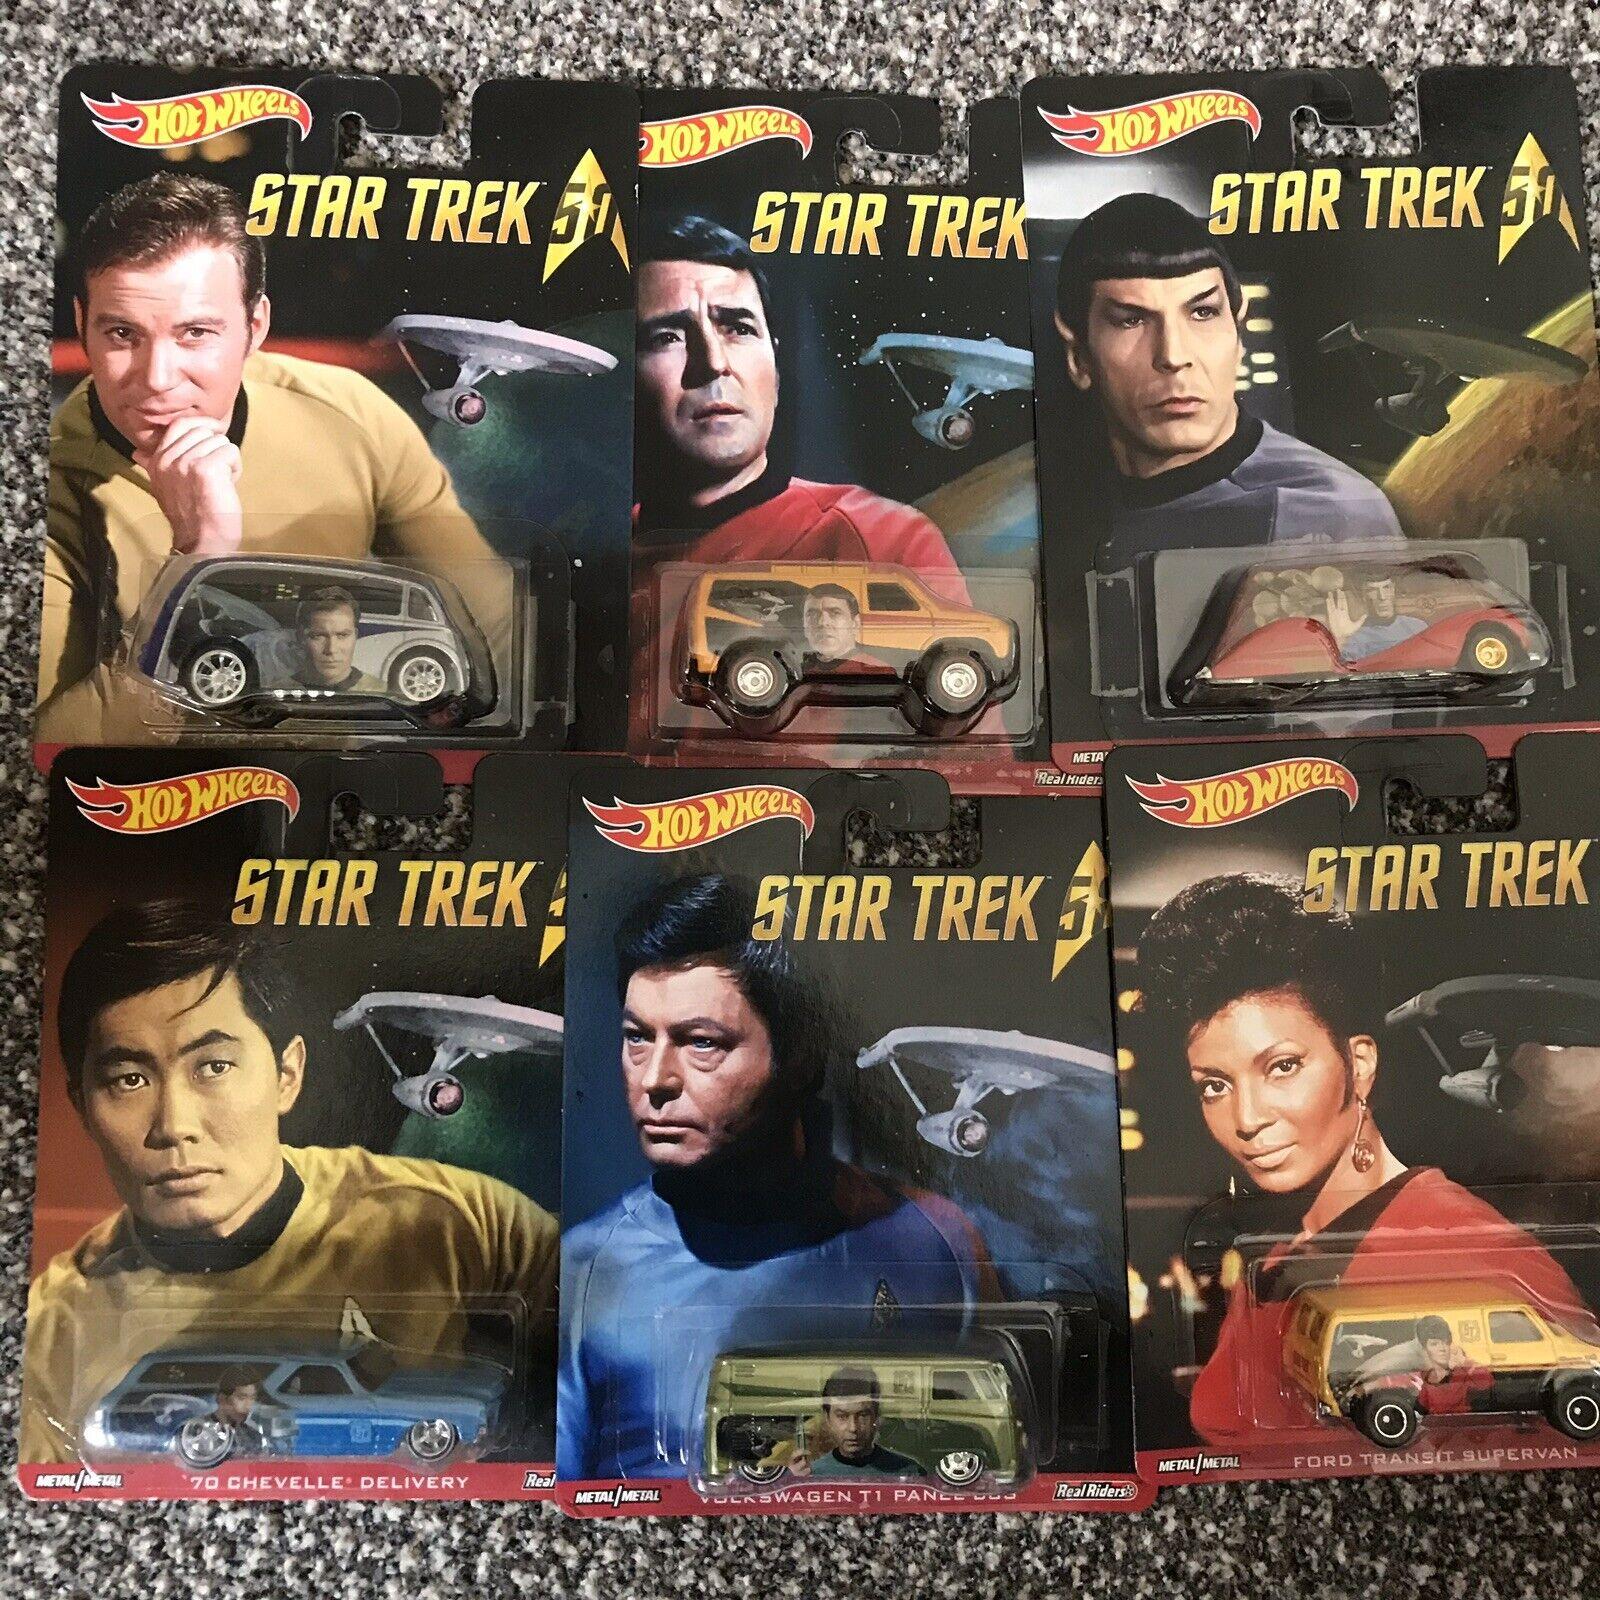 Hotwheels Set Completo De Colección De Star Trek